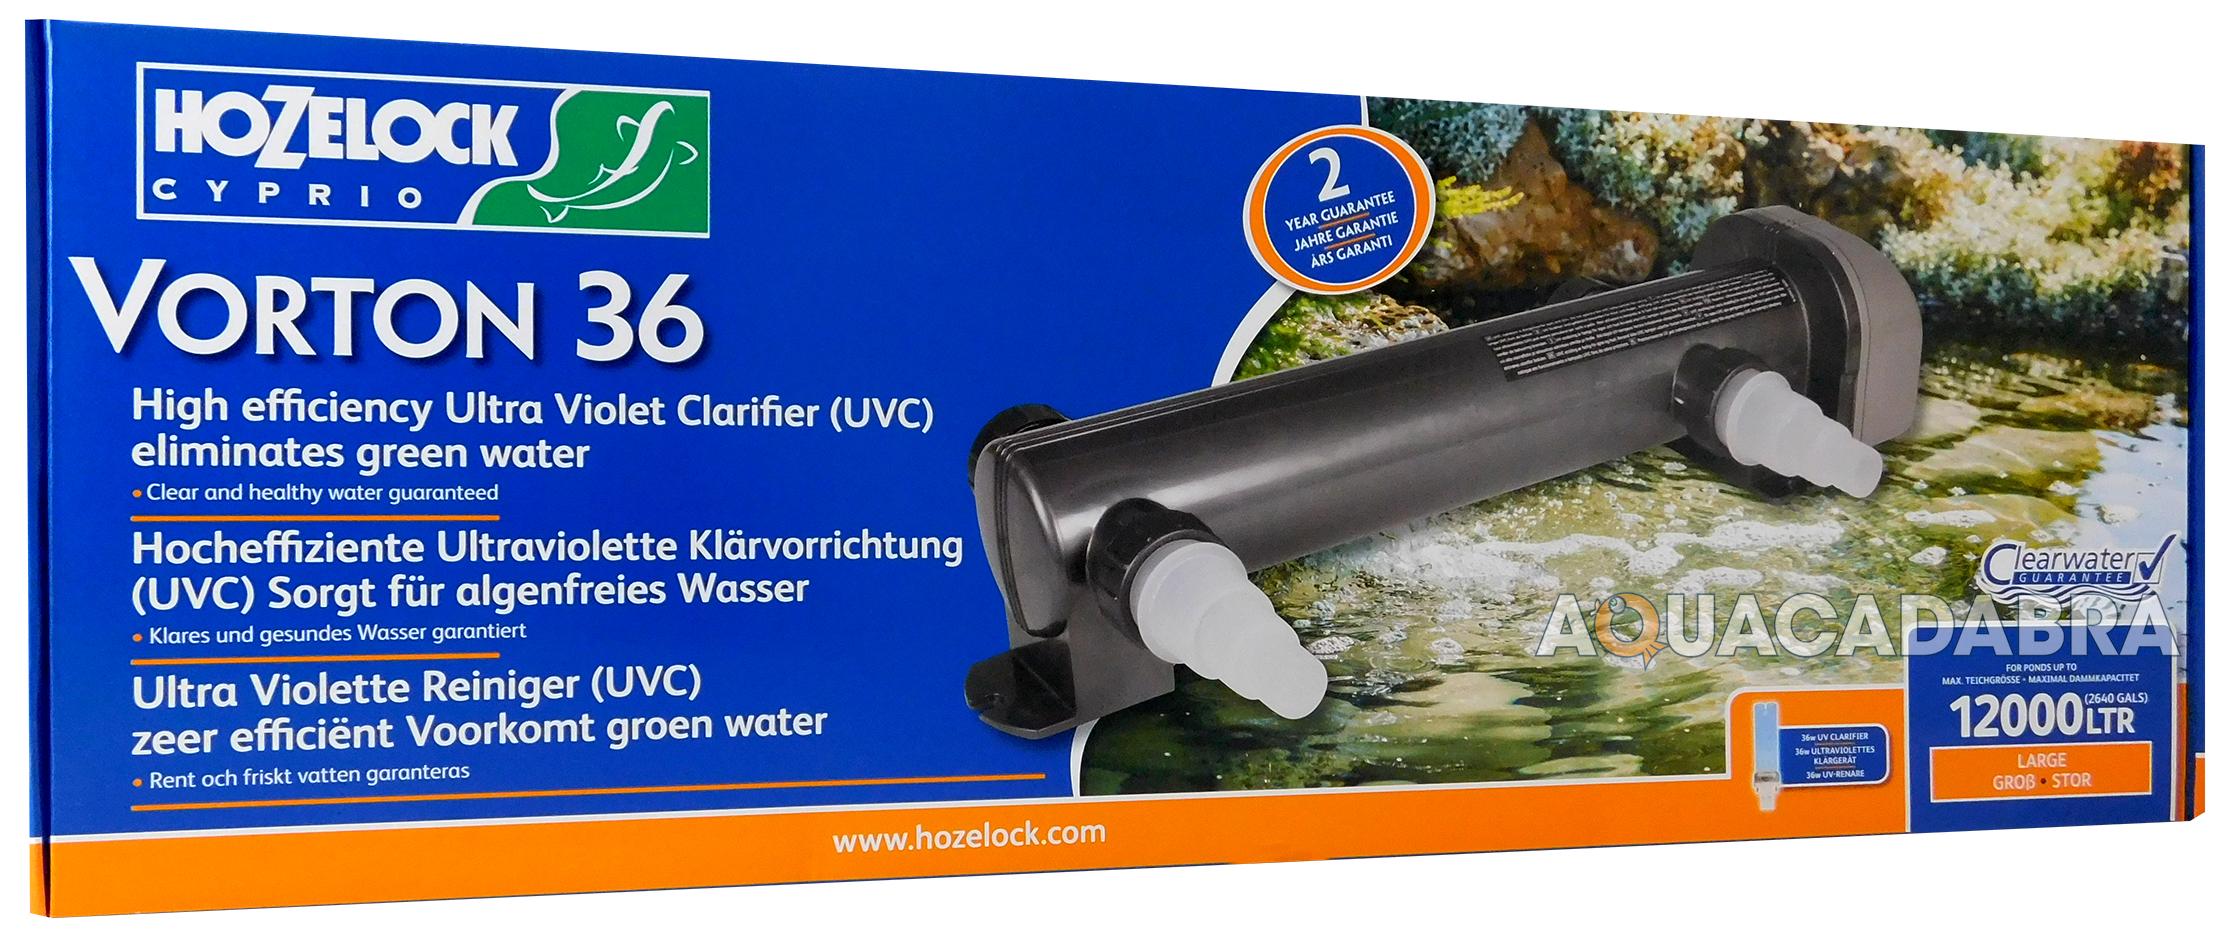 Hozelock cyprio vorton uvc unit garden pond koi fish water for Acqua verde laghetto